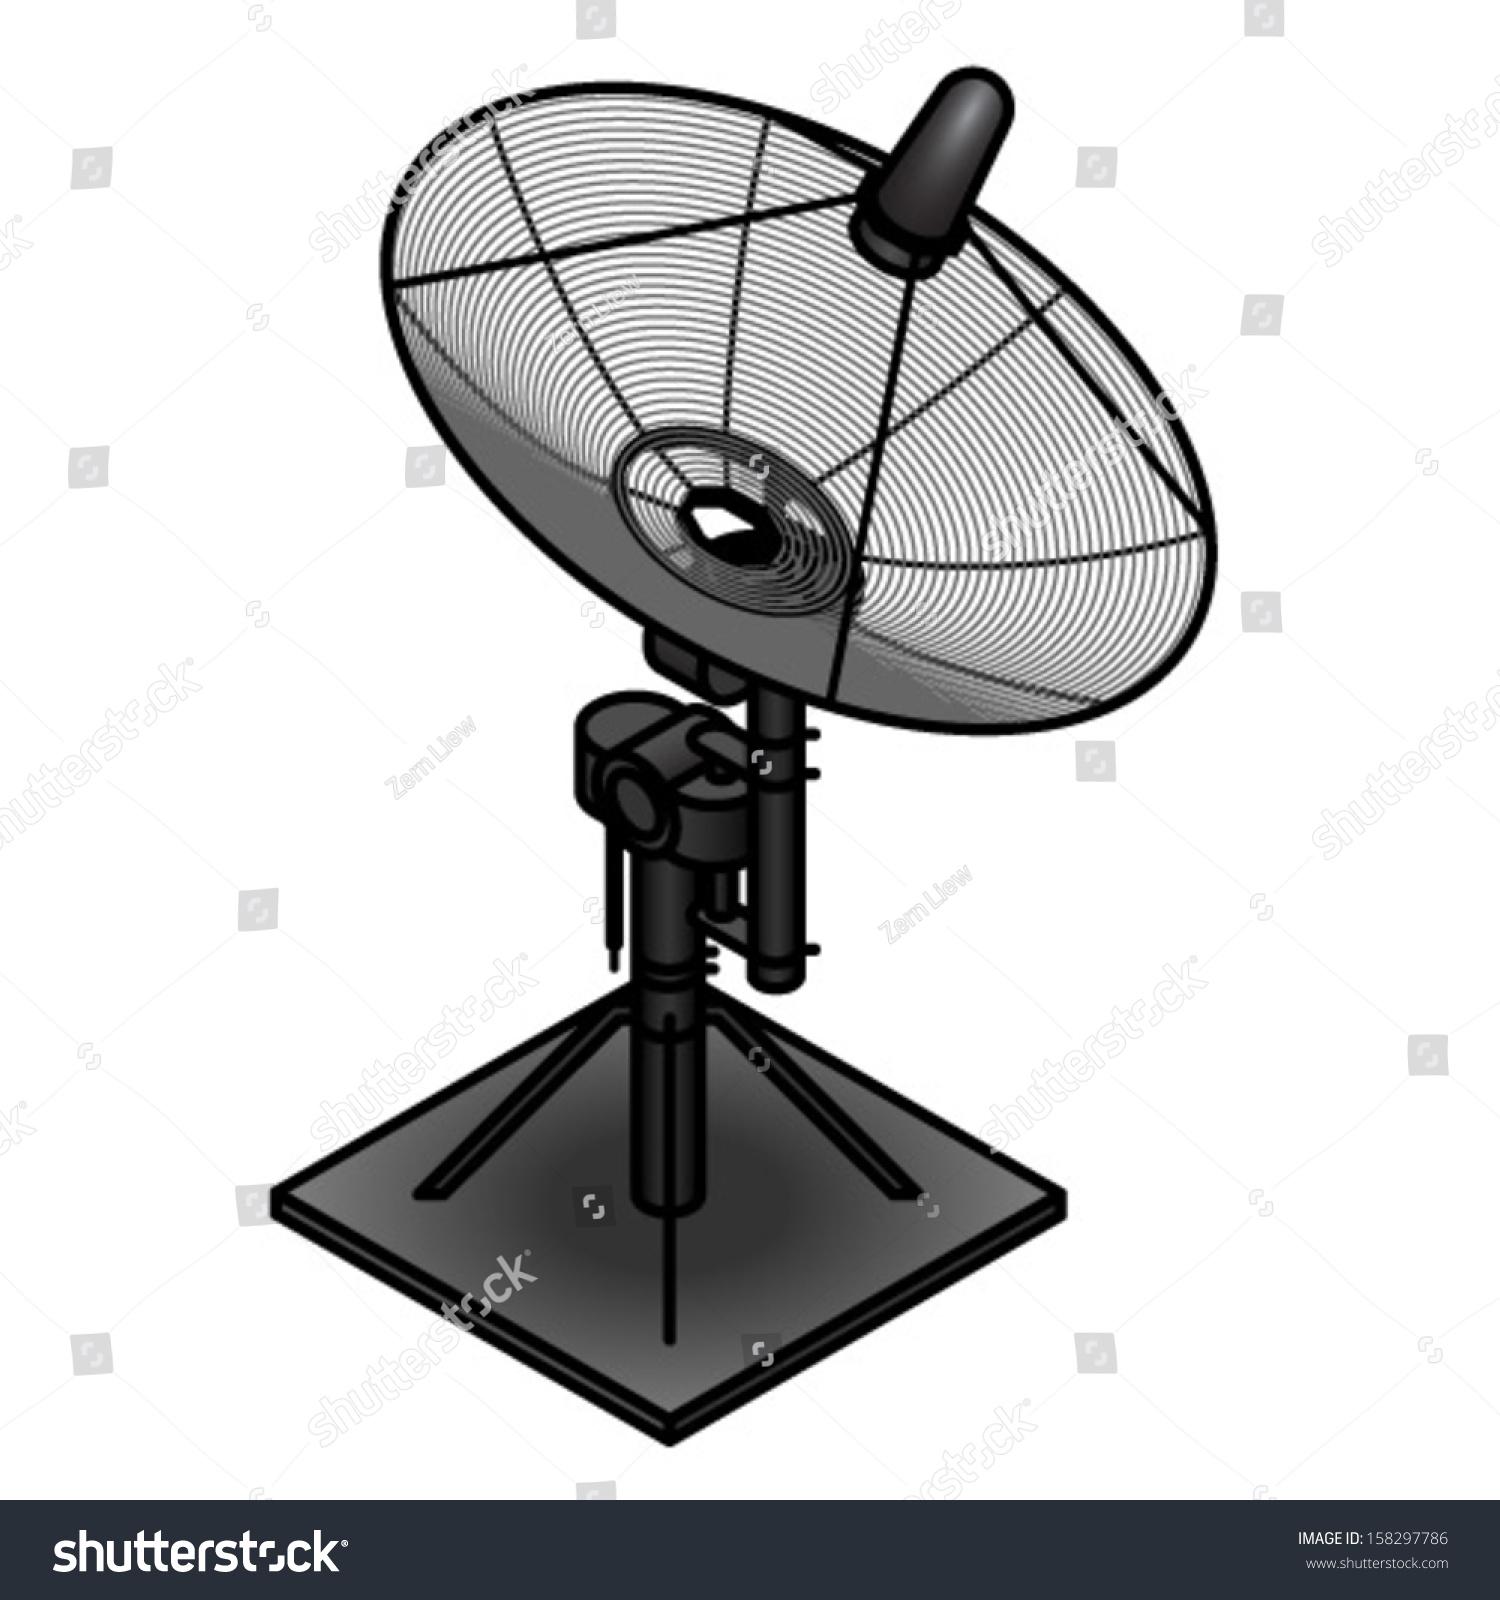 Small Satellite Dish On Motorised Mount Stock Vector